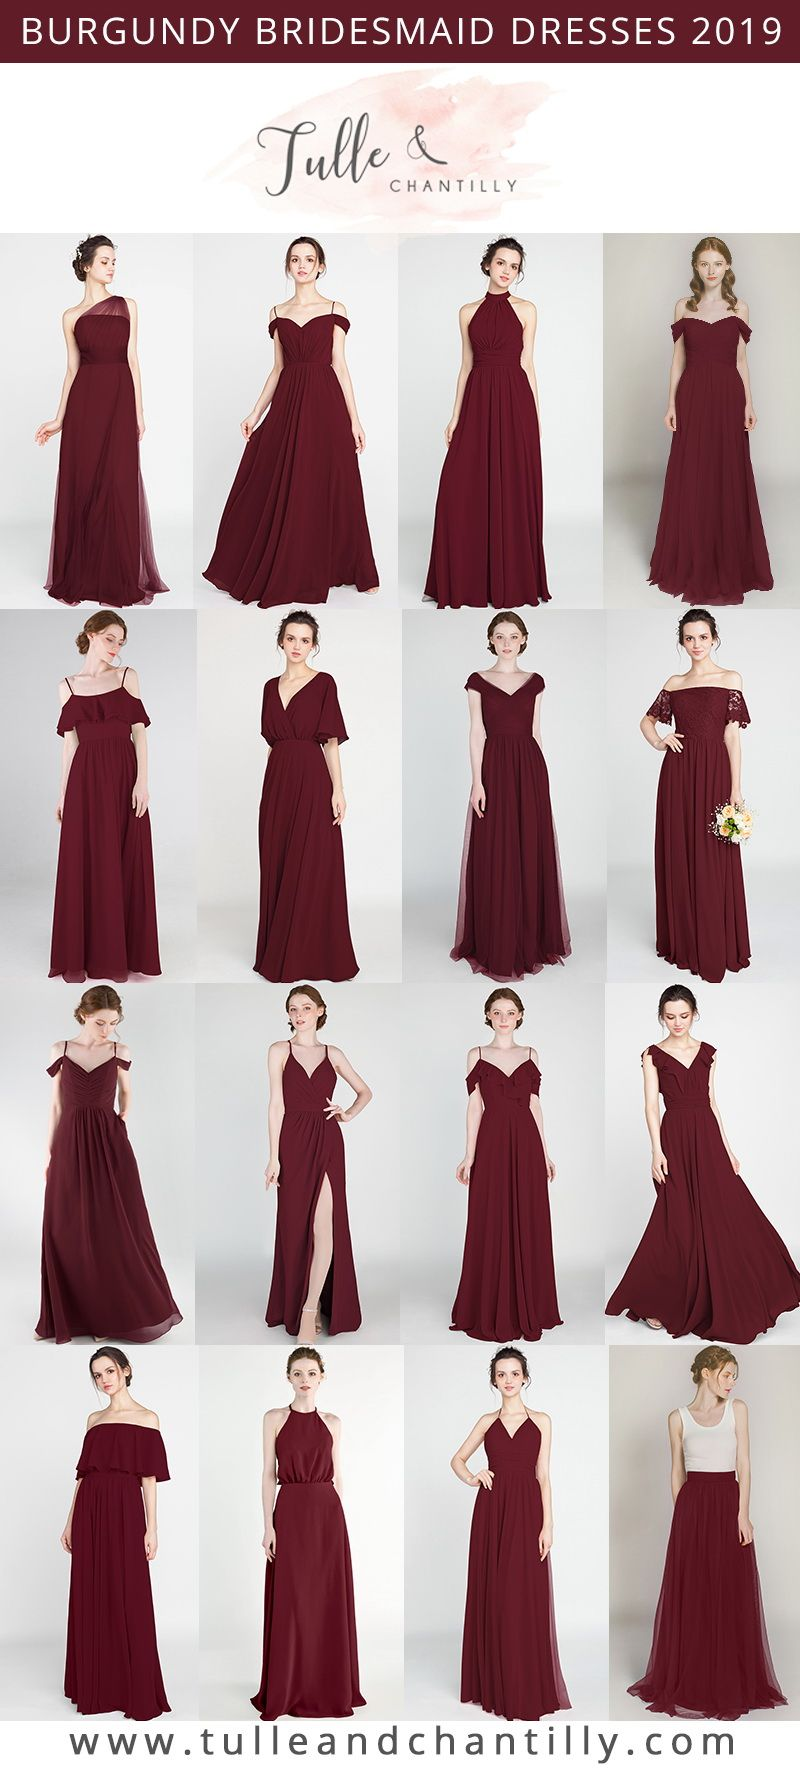 Long & Short Bridesmaid Dresses: $79-$149, Size 0-30 and 50+ Colors